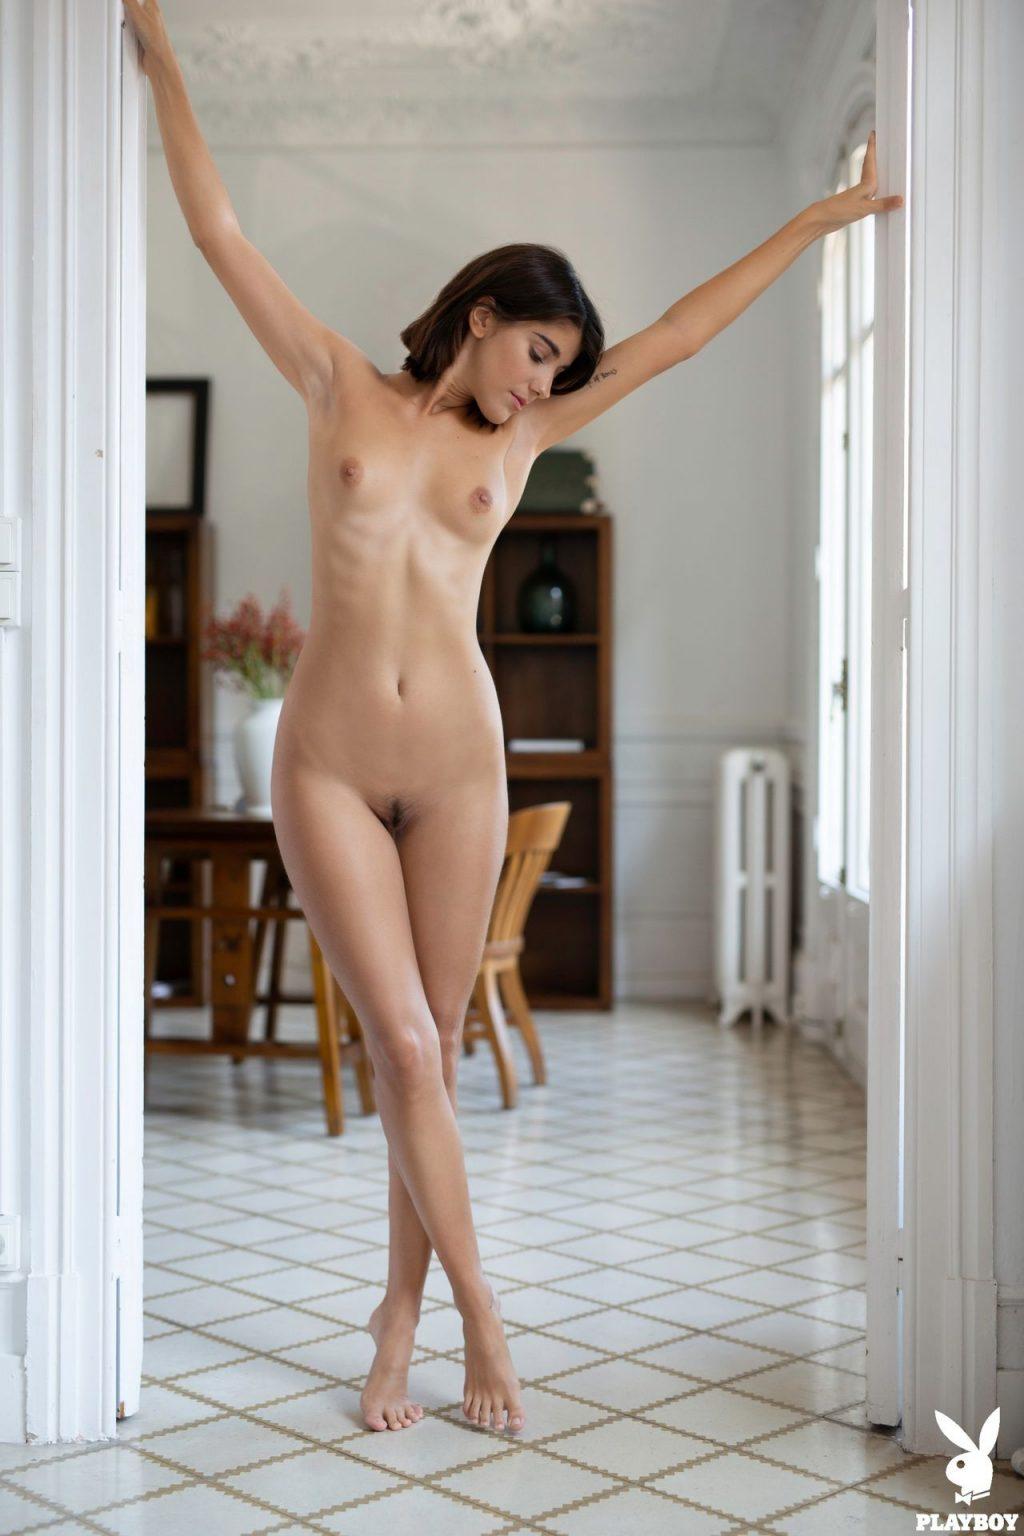 Ana Barbara Nude ana maria naked (5 photos) – ( ͡° ͜ʖ ͡°) |the fappening